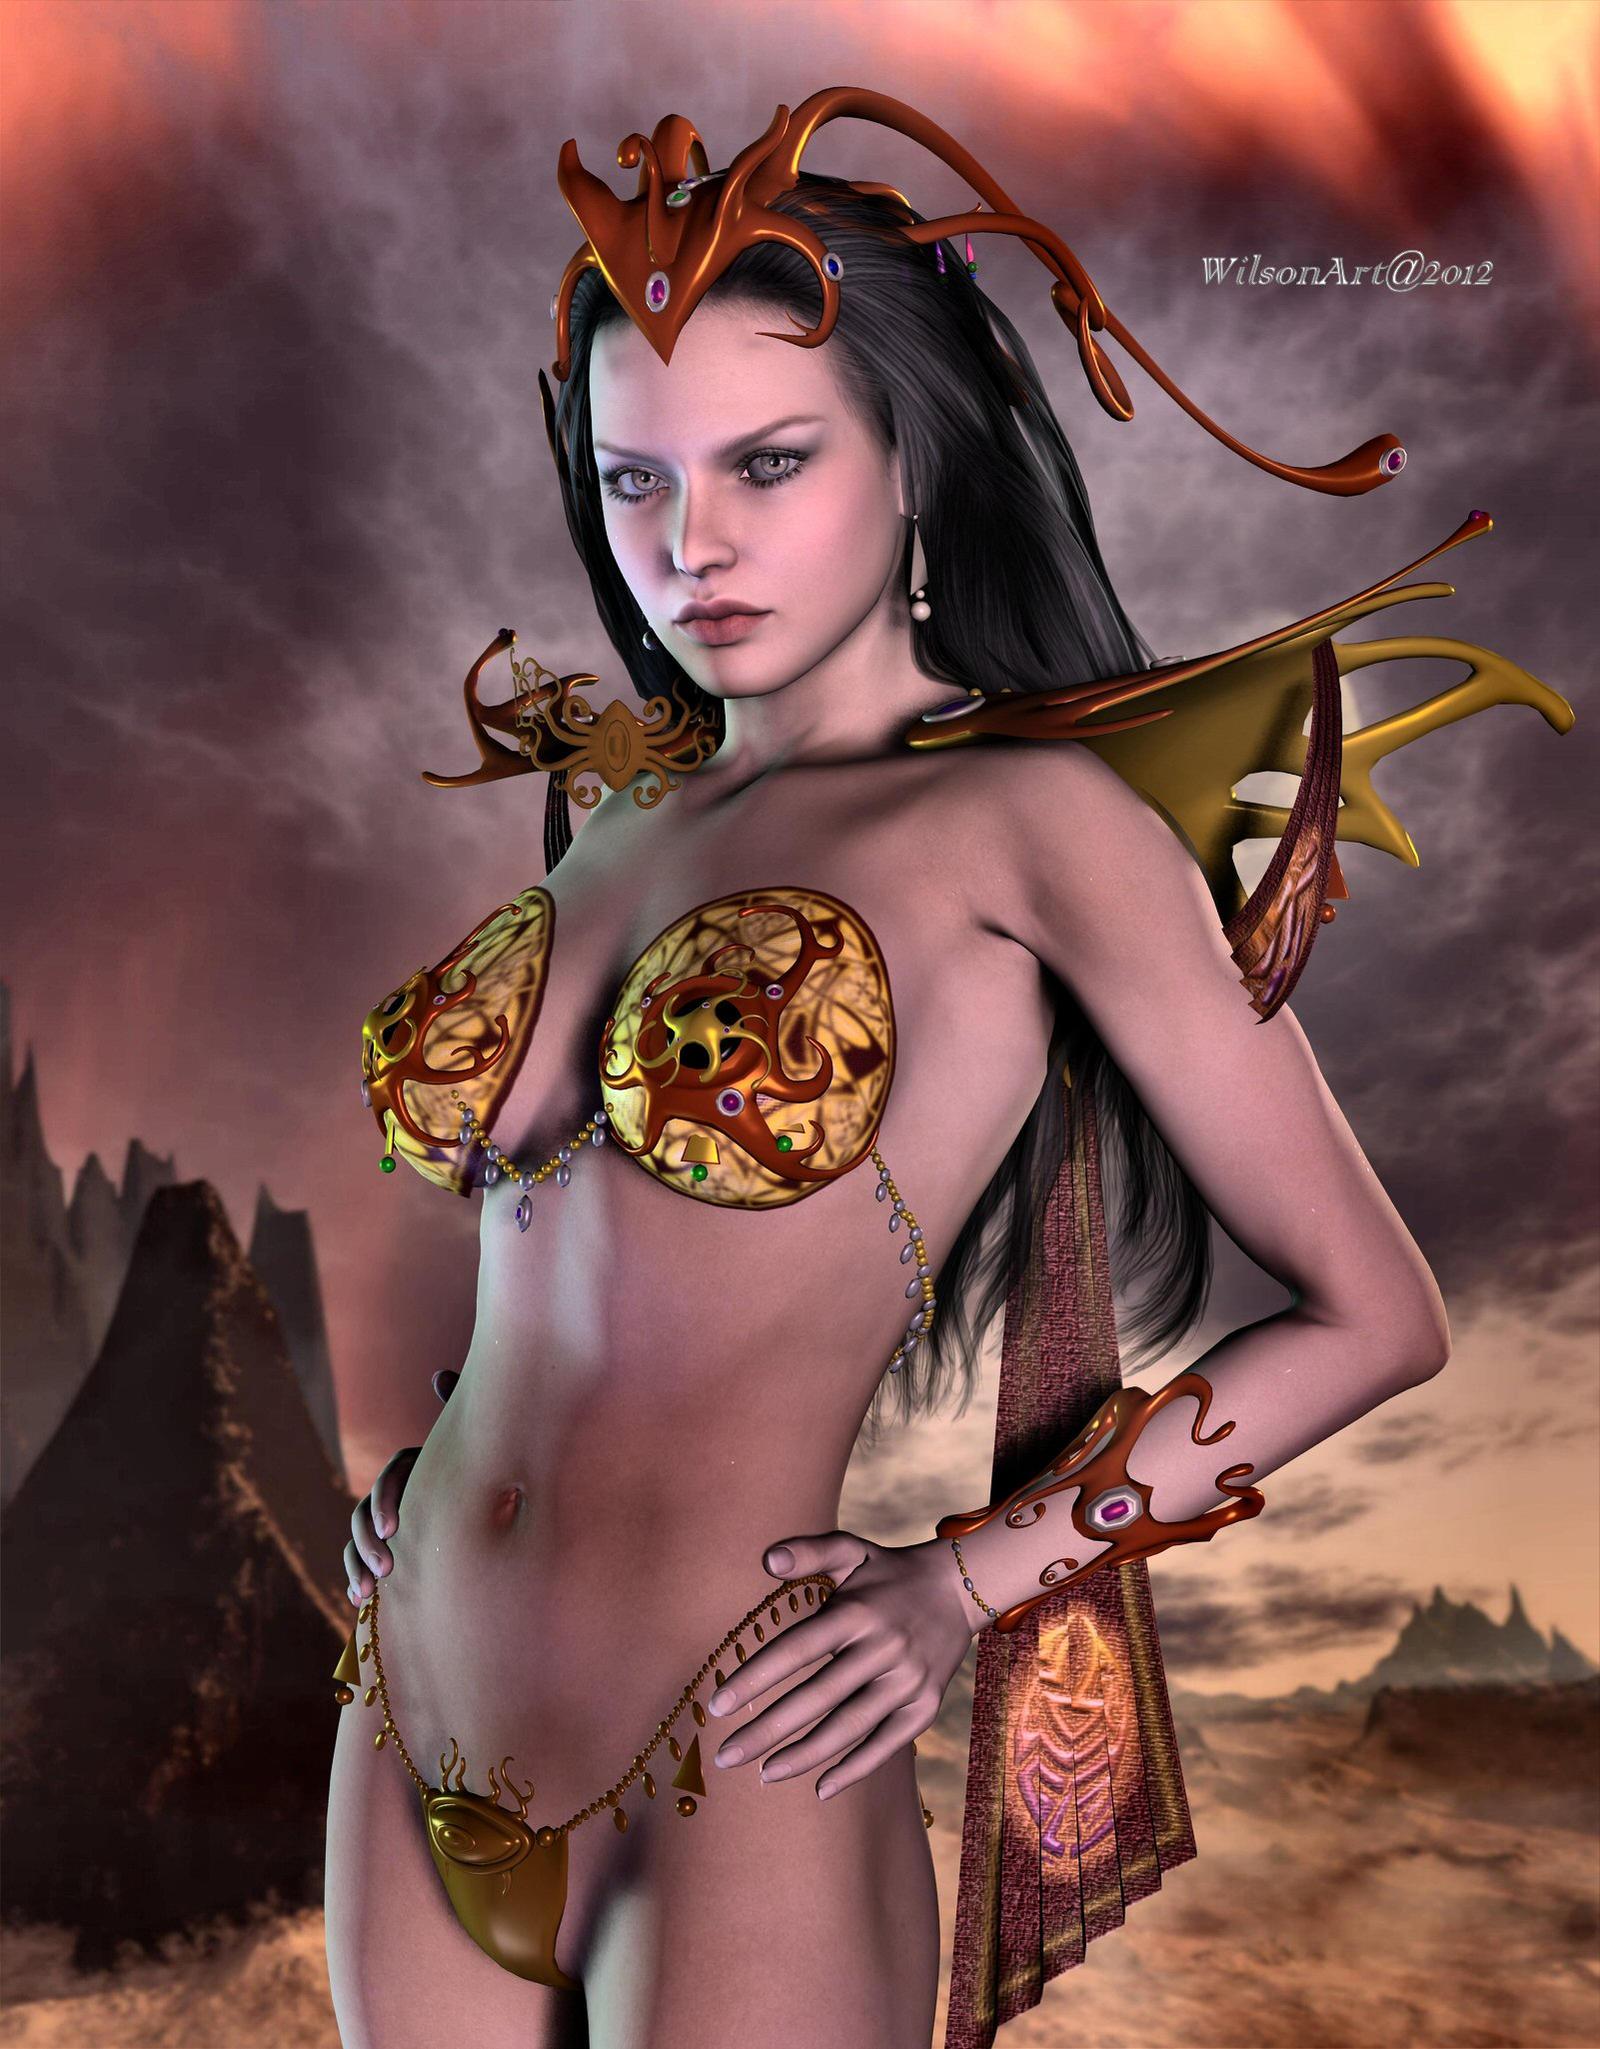 a_princess_of_mars_by_nickieboy2004-d4qexj2.jpg